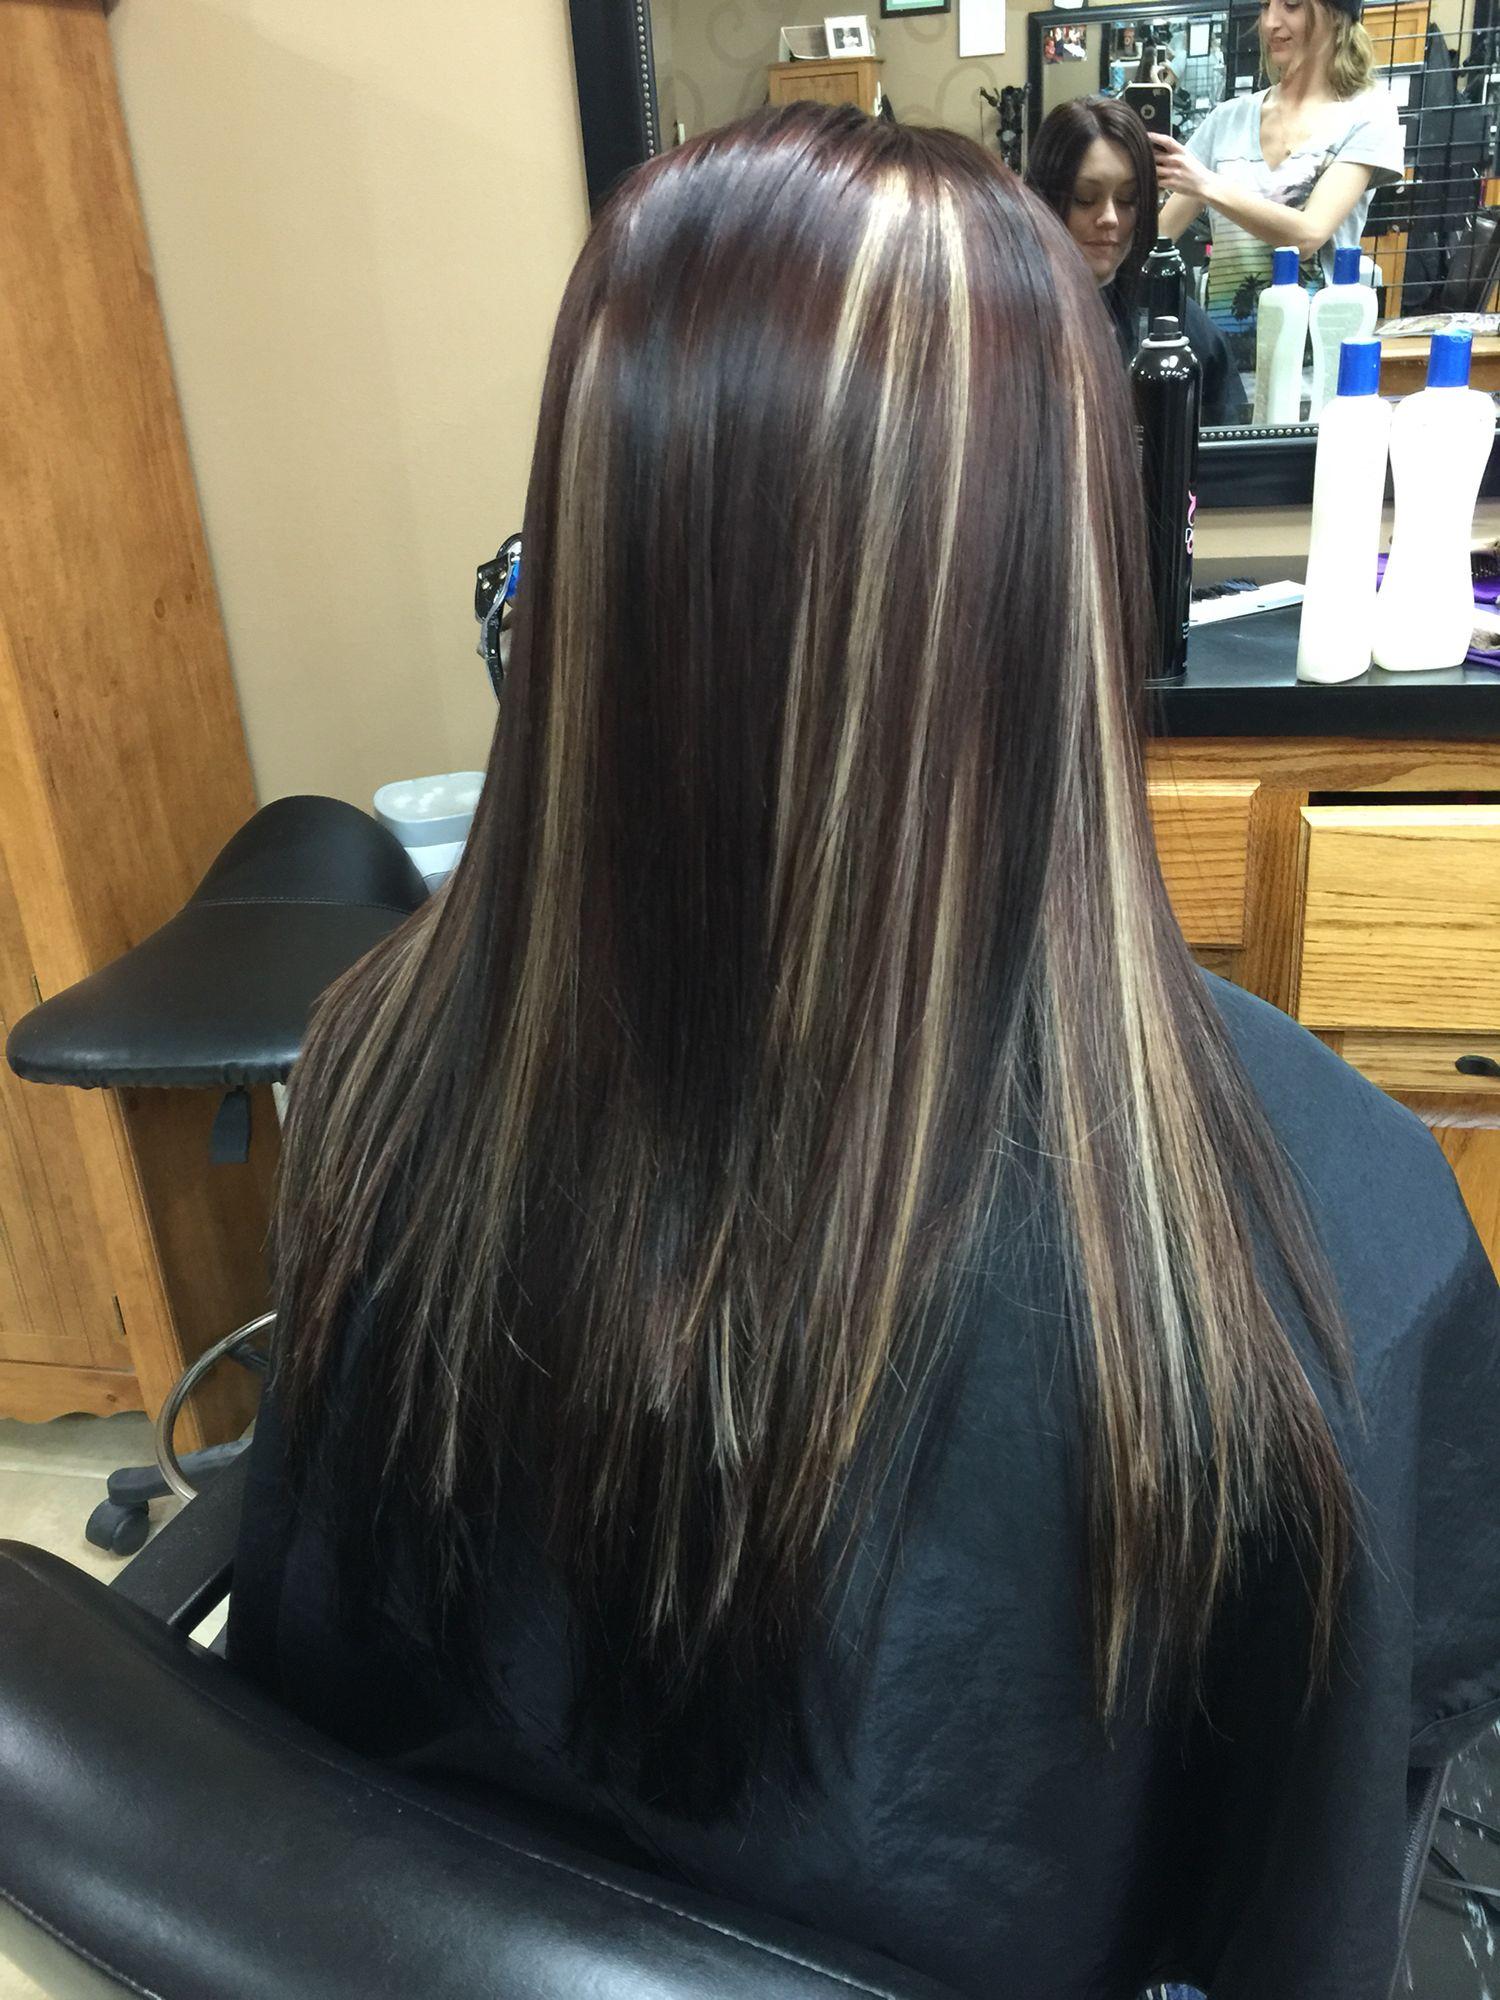 Dark Brown Black Hair With Heavy Platinum Highlights Highlights For Dark Brown Hair Hair Styles Blonde Hair With Highlights